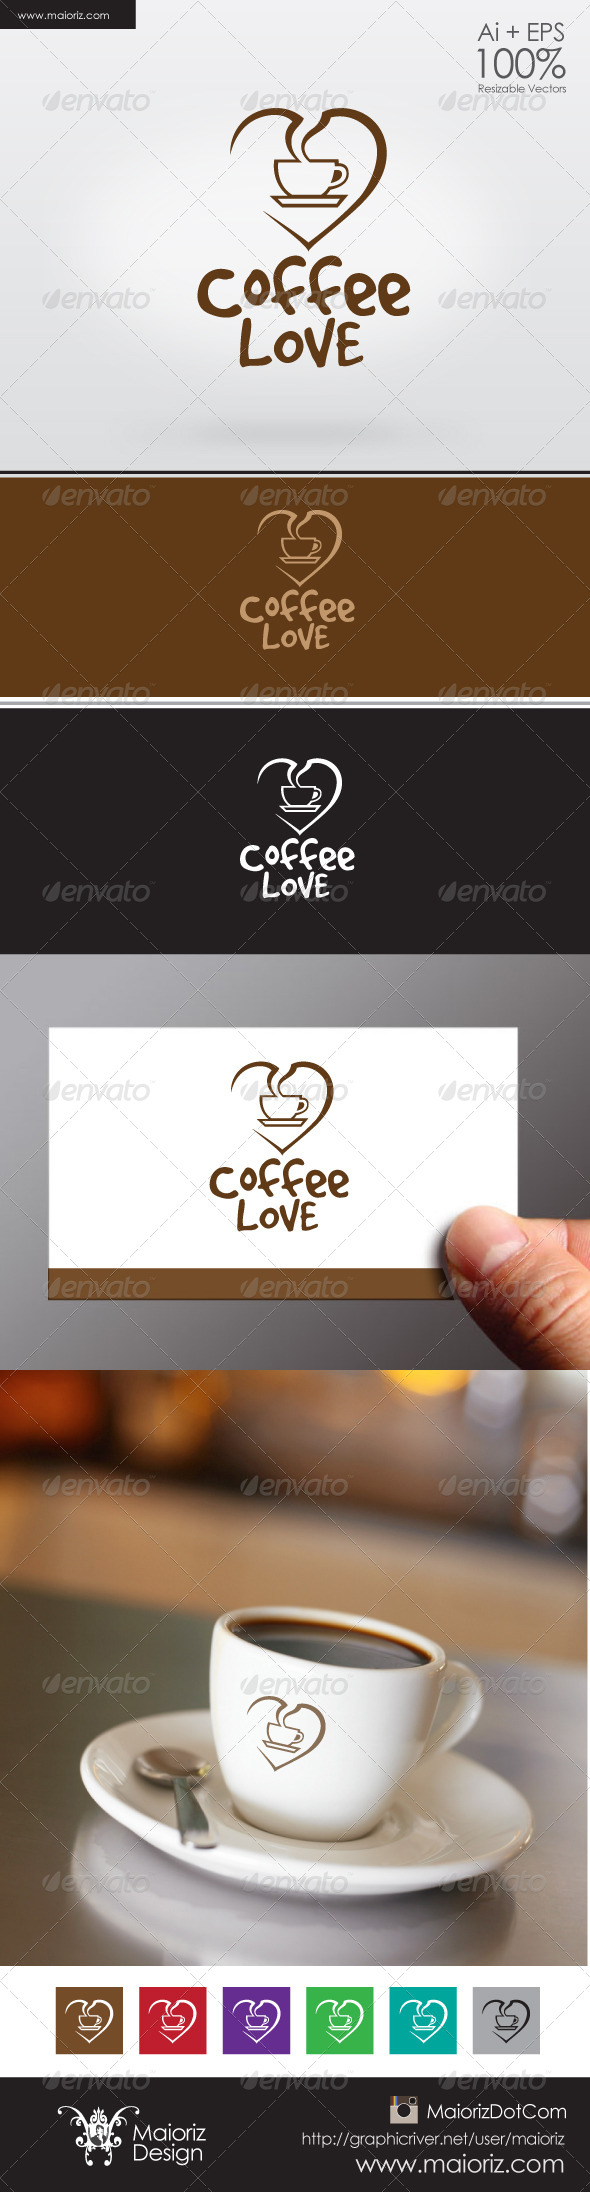 GraphicRiver Coffee Lover Logo 6256581